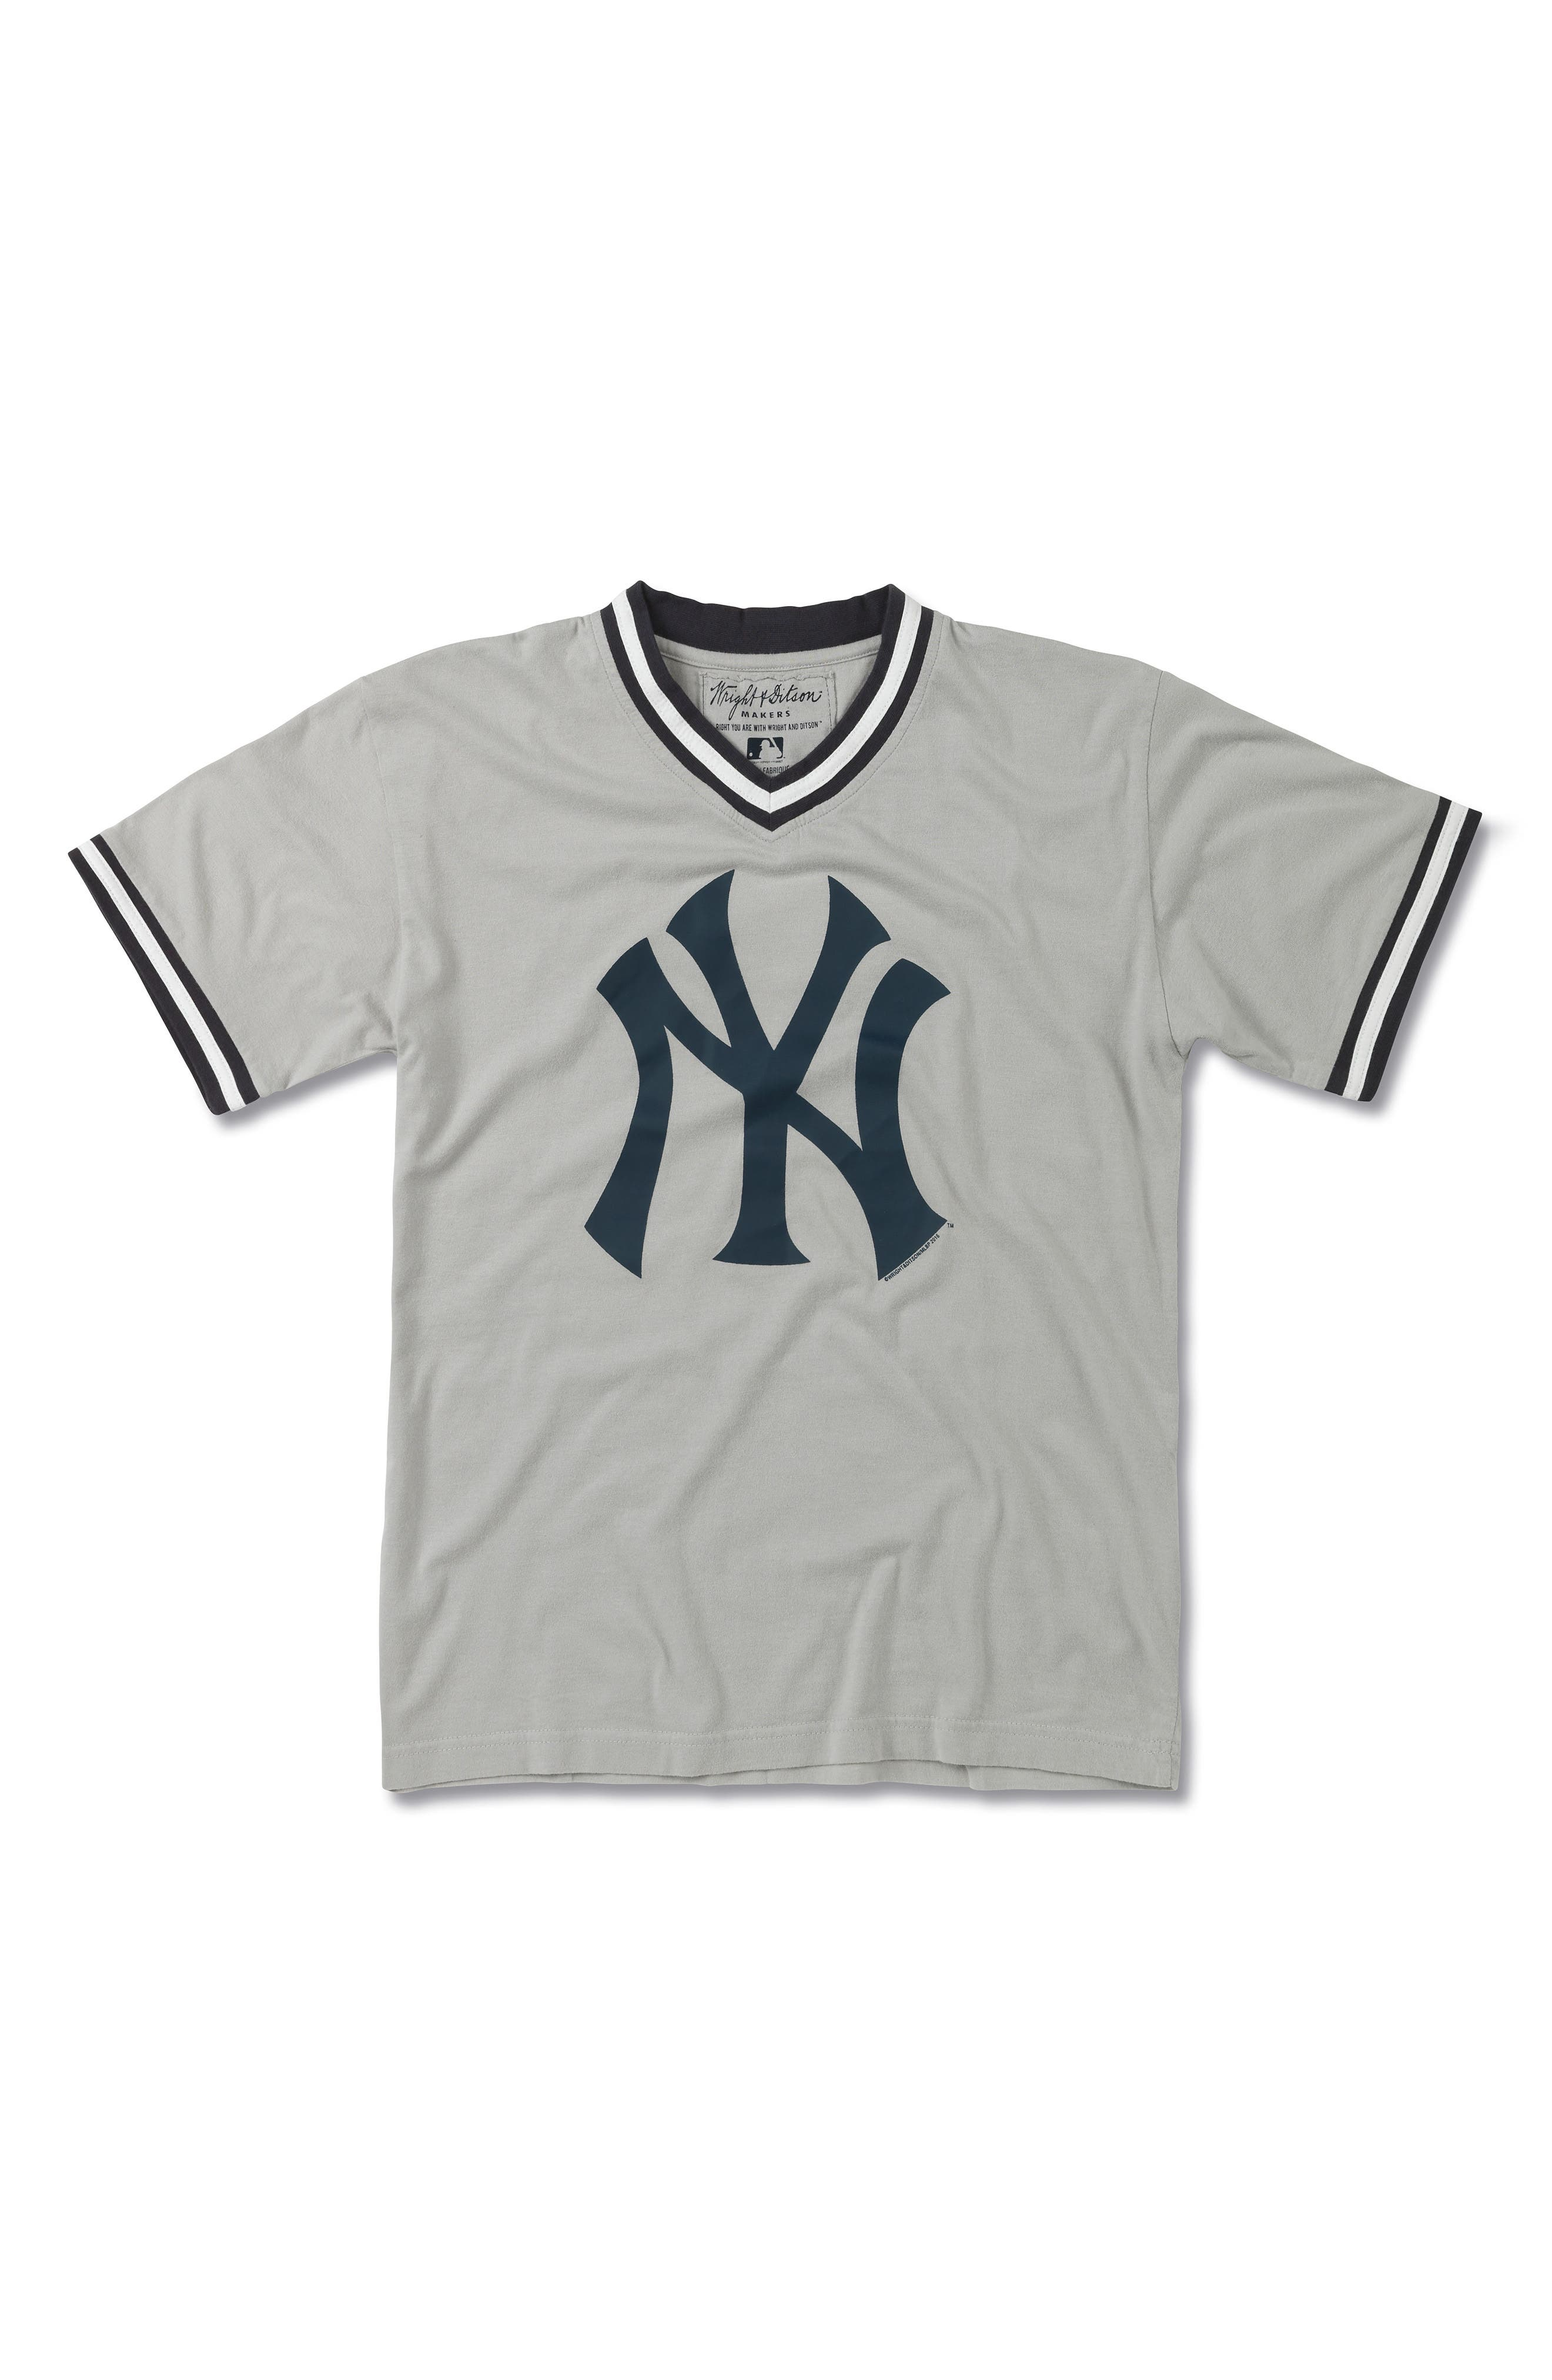 Main Image - Wright & Ditson New York Yankees T-Shirt (Little Boys & Big Boys)